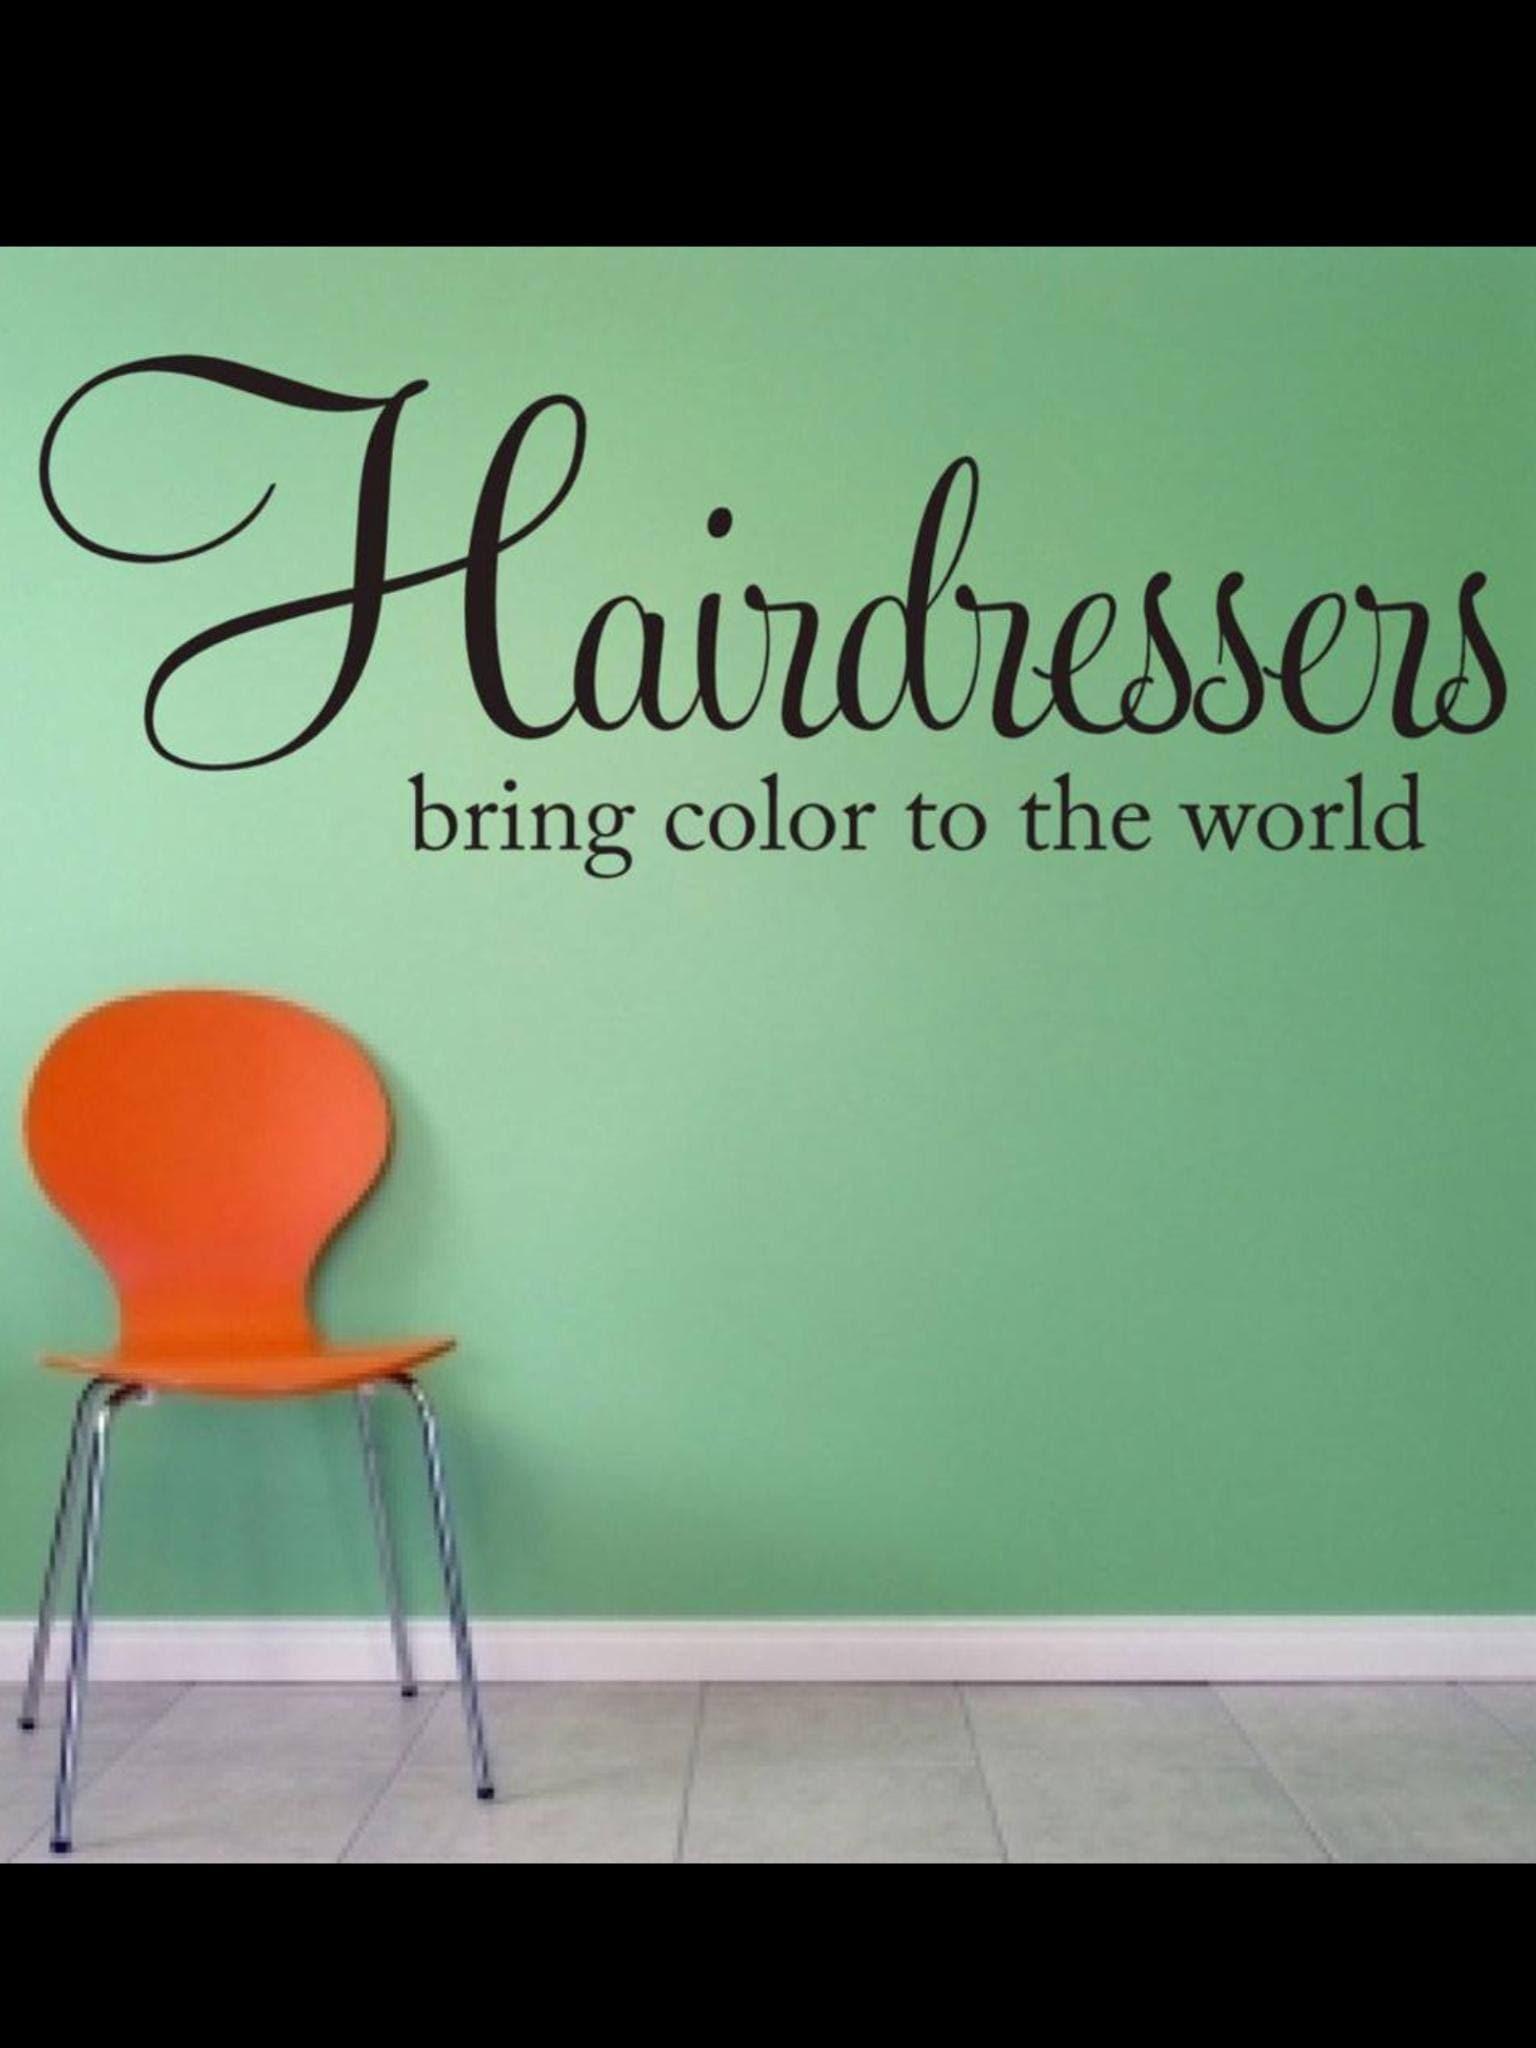 Lanae Hair And Beauty - Hairdressers - 62A Aberdeen St - Geelong West